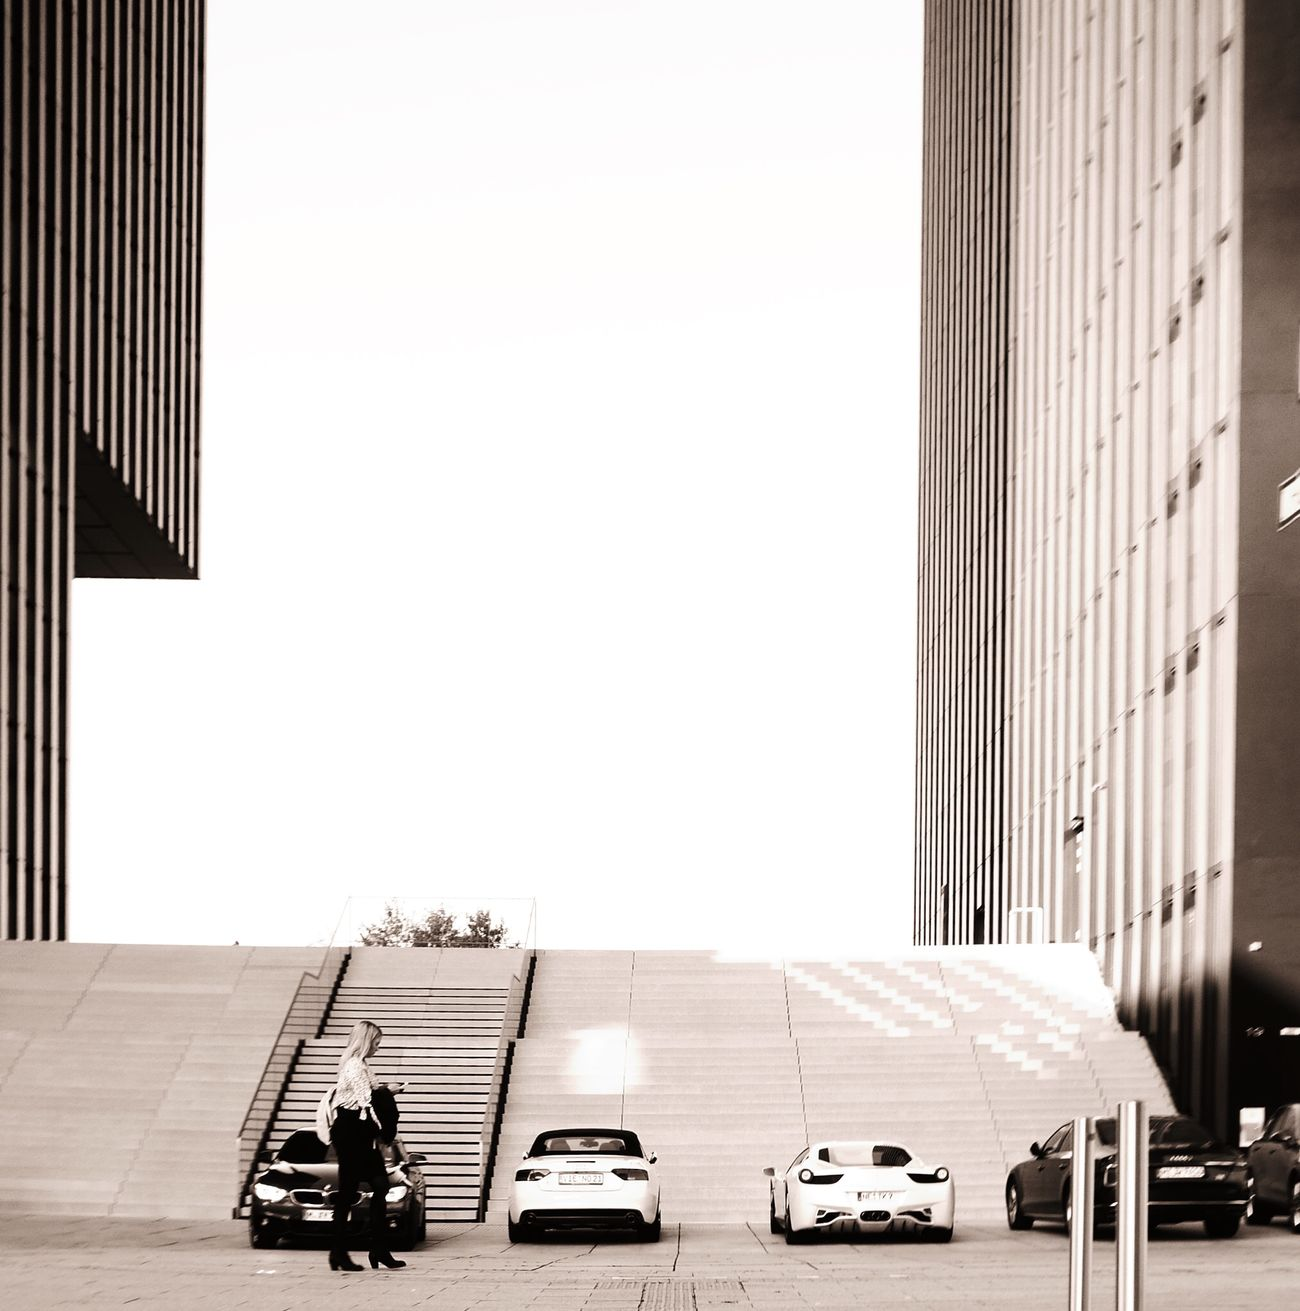 Hot Walk Supercars